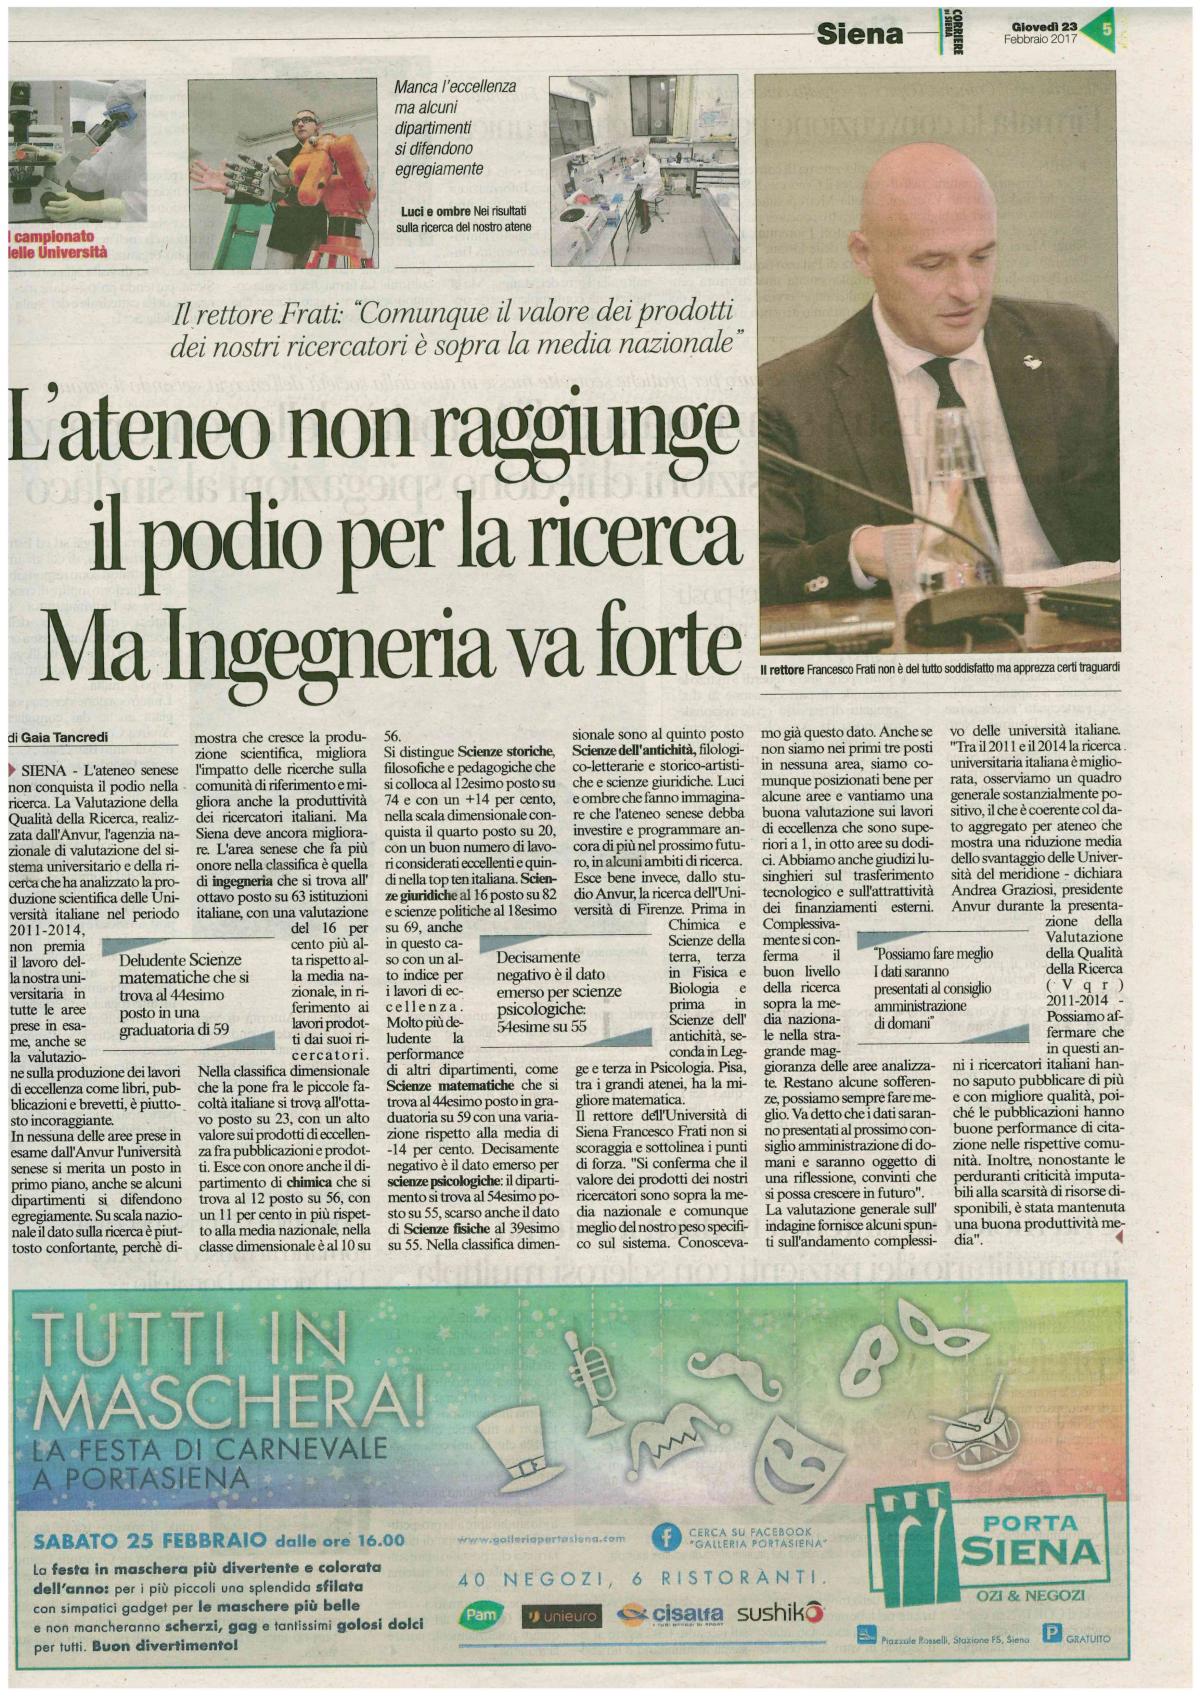 Ingegneria a Siena è ottava su 68 inItalia